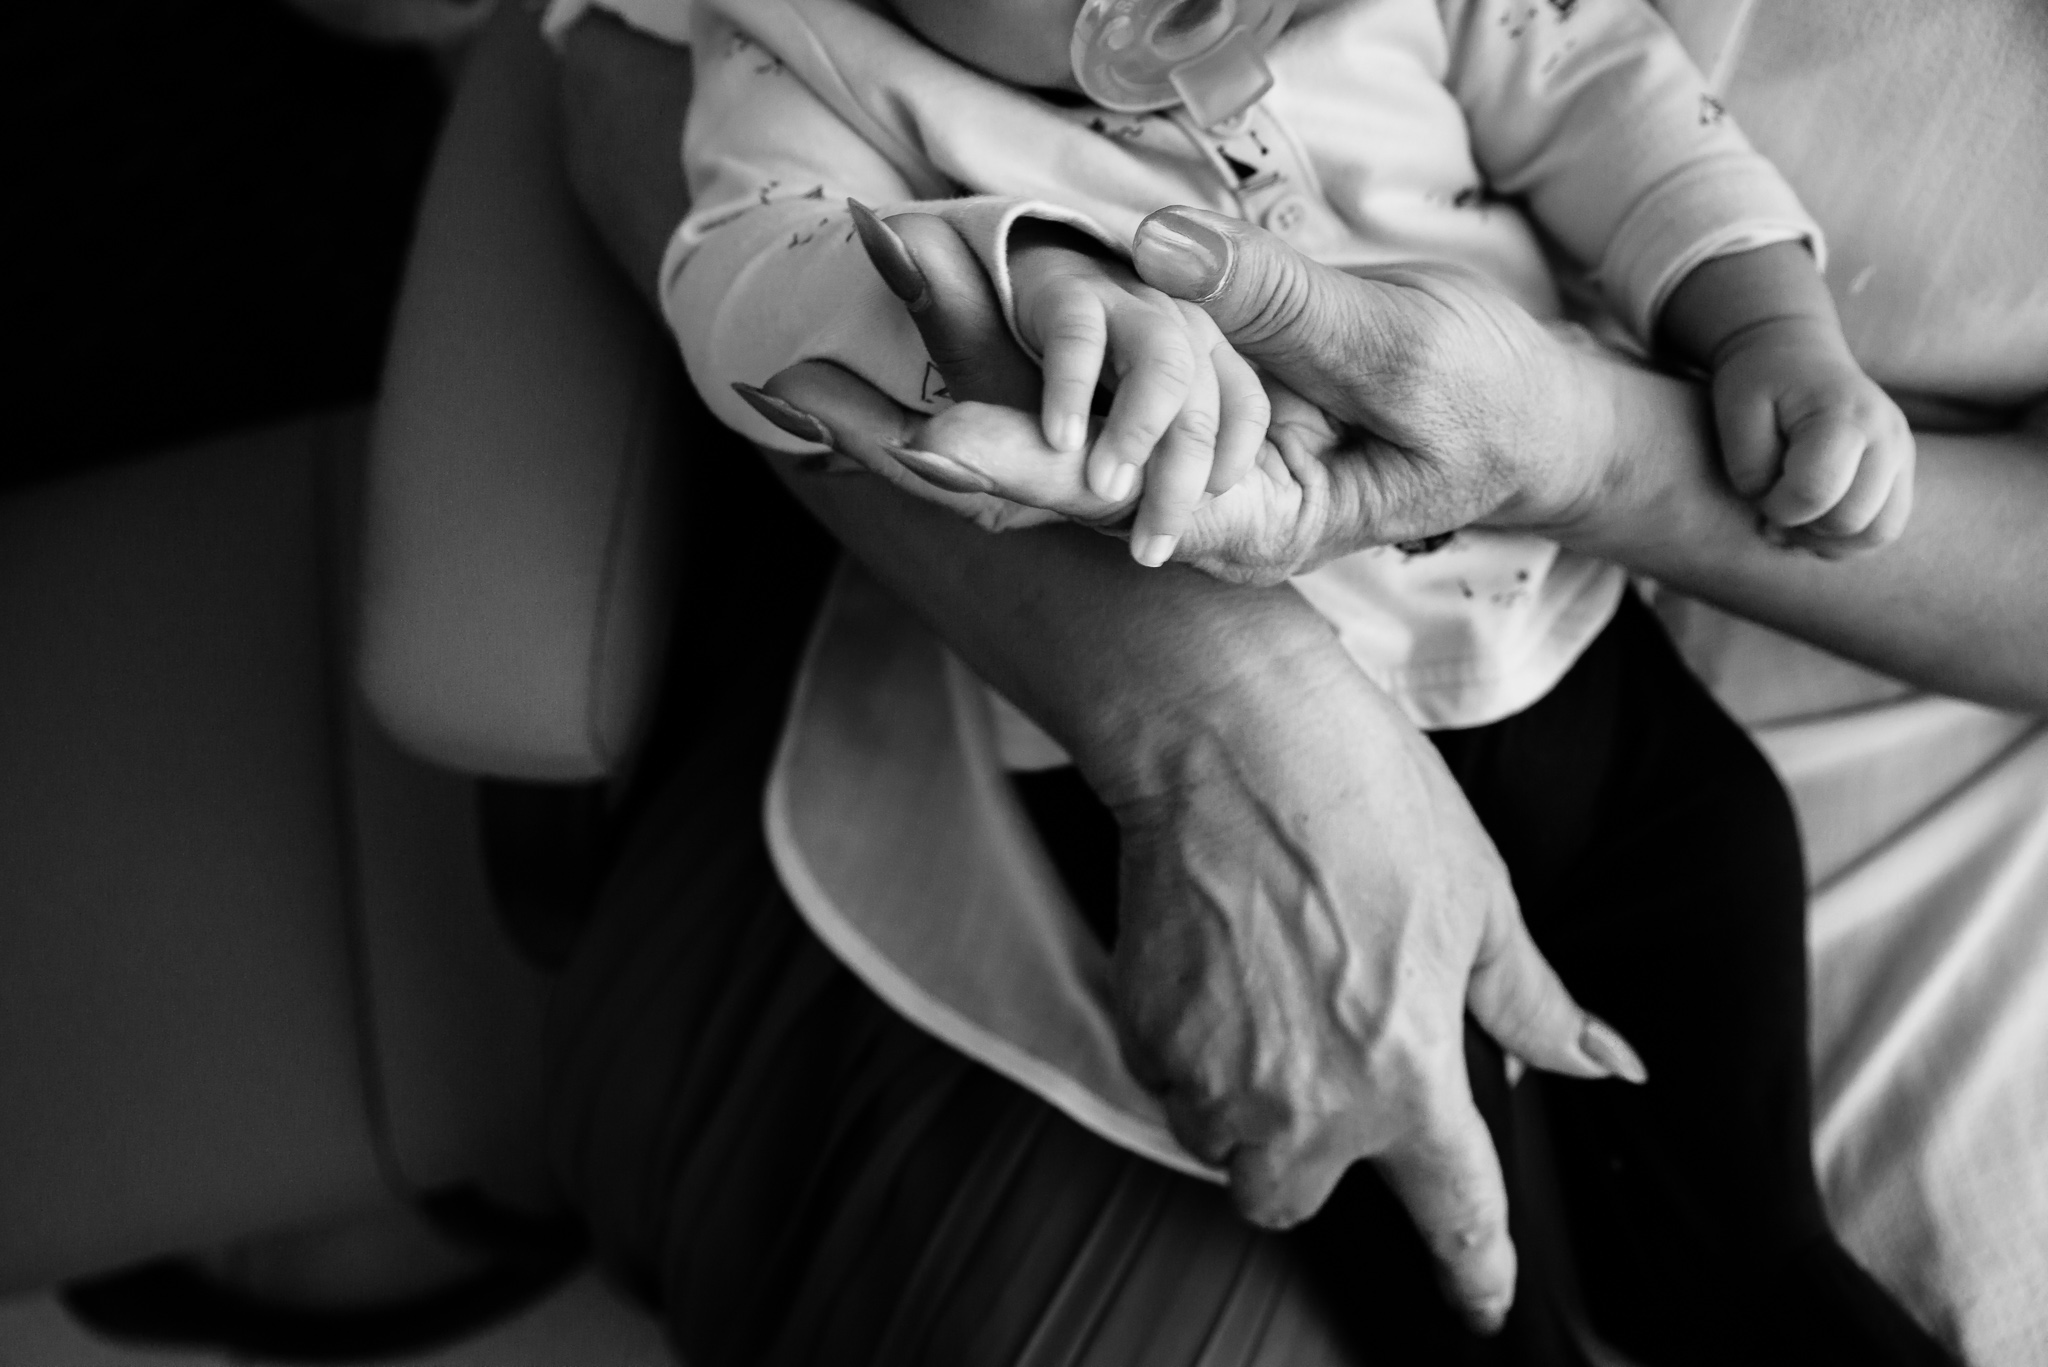 Lana-Photographs-Abu-Dhabi-Newborn-Photographer-Egla-PSLR-38.jpg